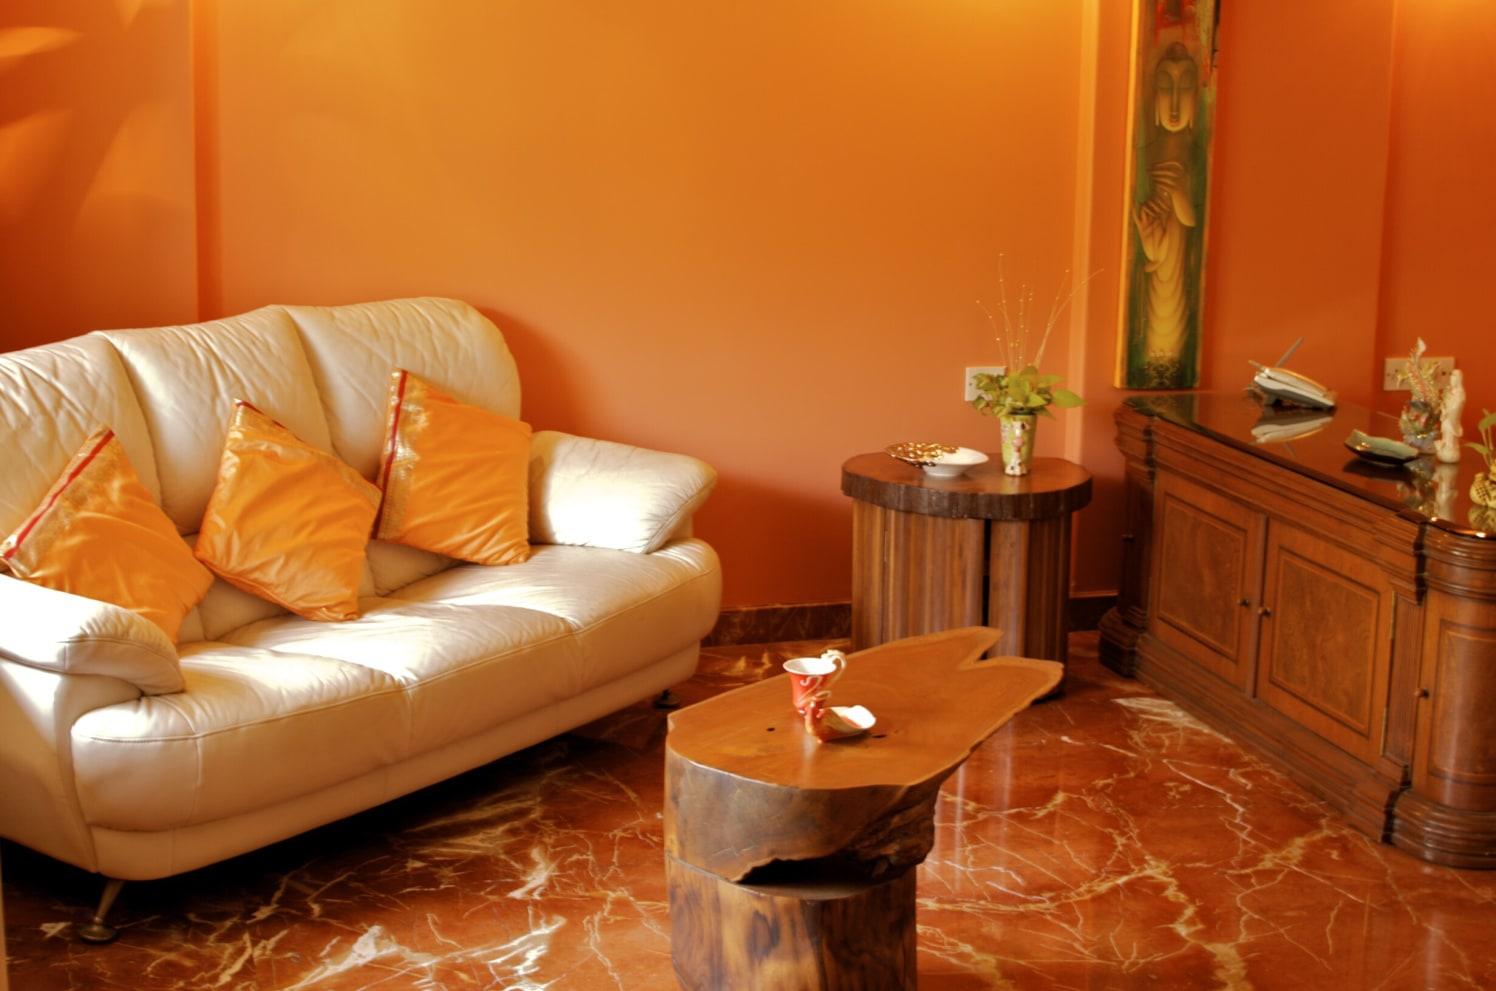 Stunning Living Room with White Sofa, Orange Patterned marble Flooring by Viraf Laskari  Living-room Contemporary | Interior Design Photos & Ideas